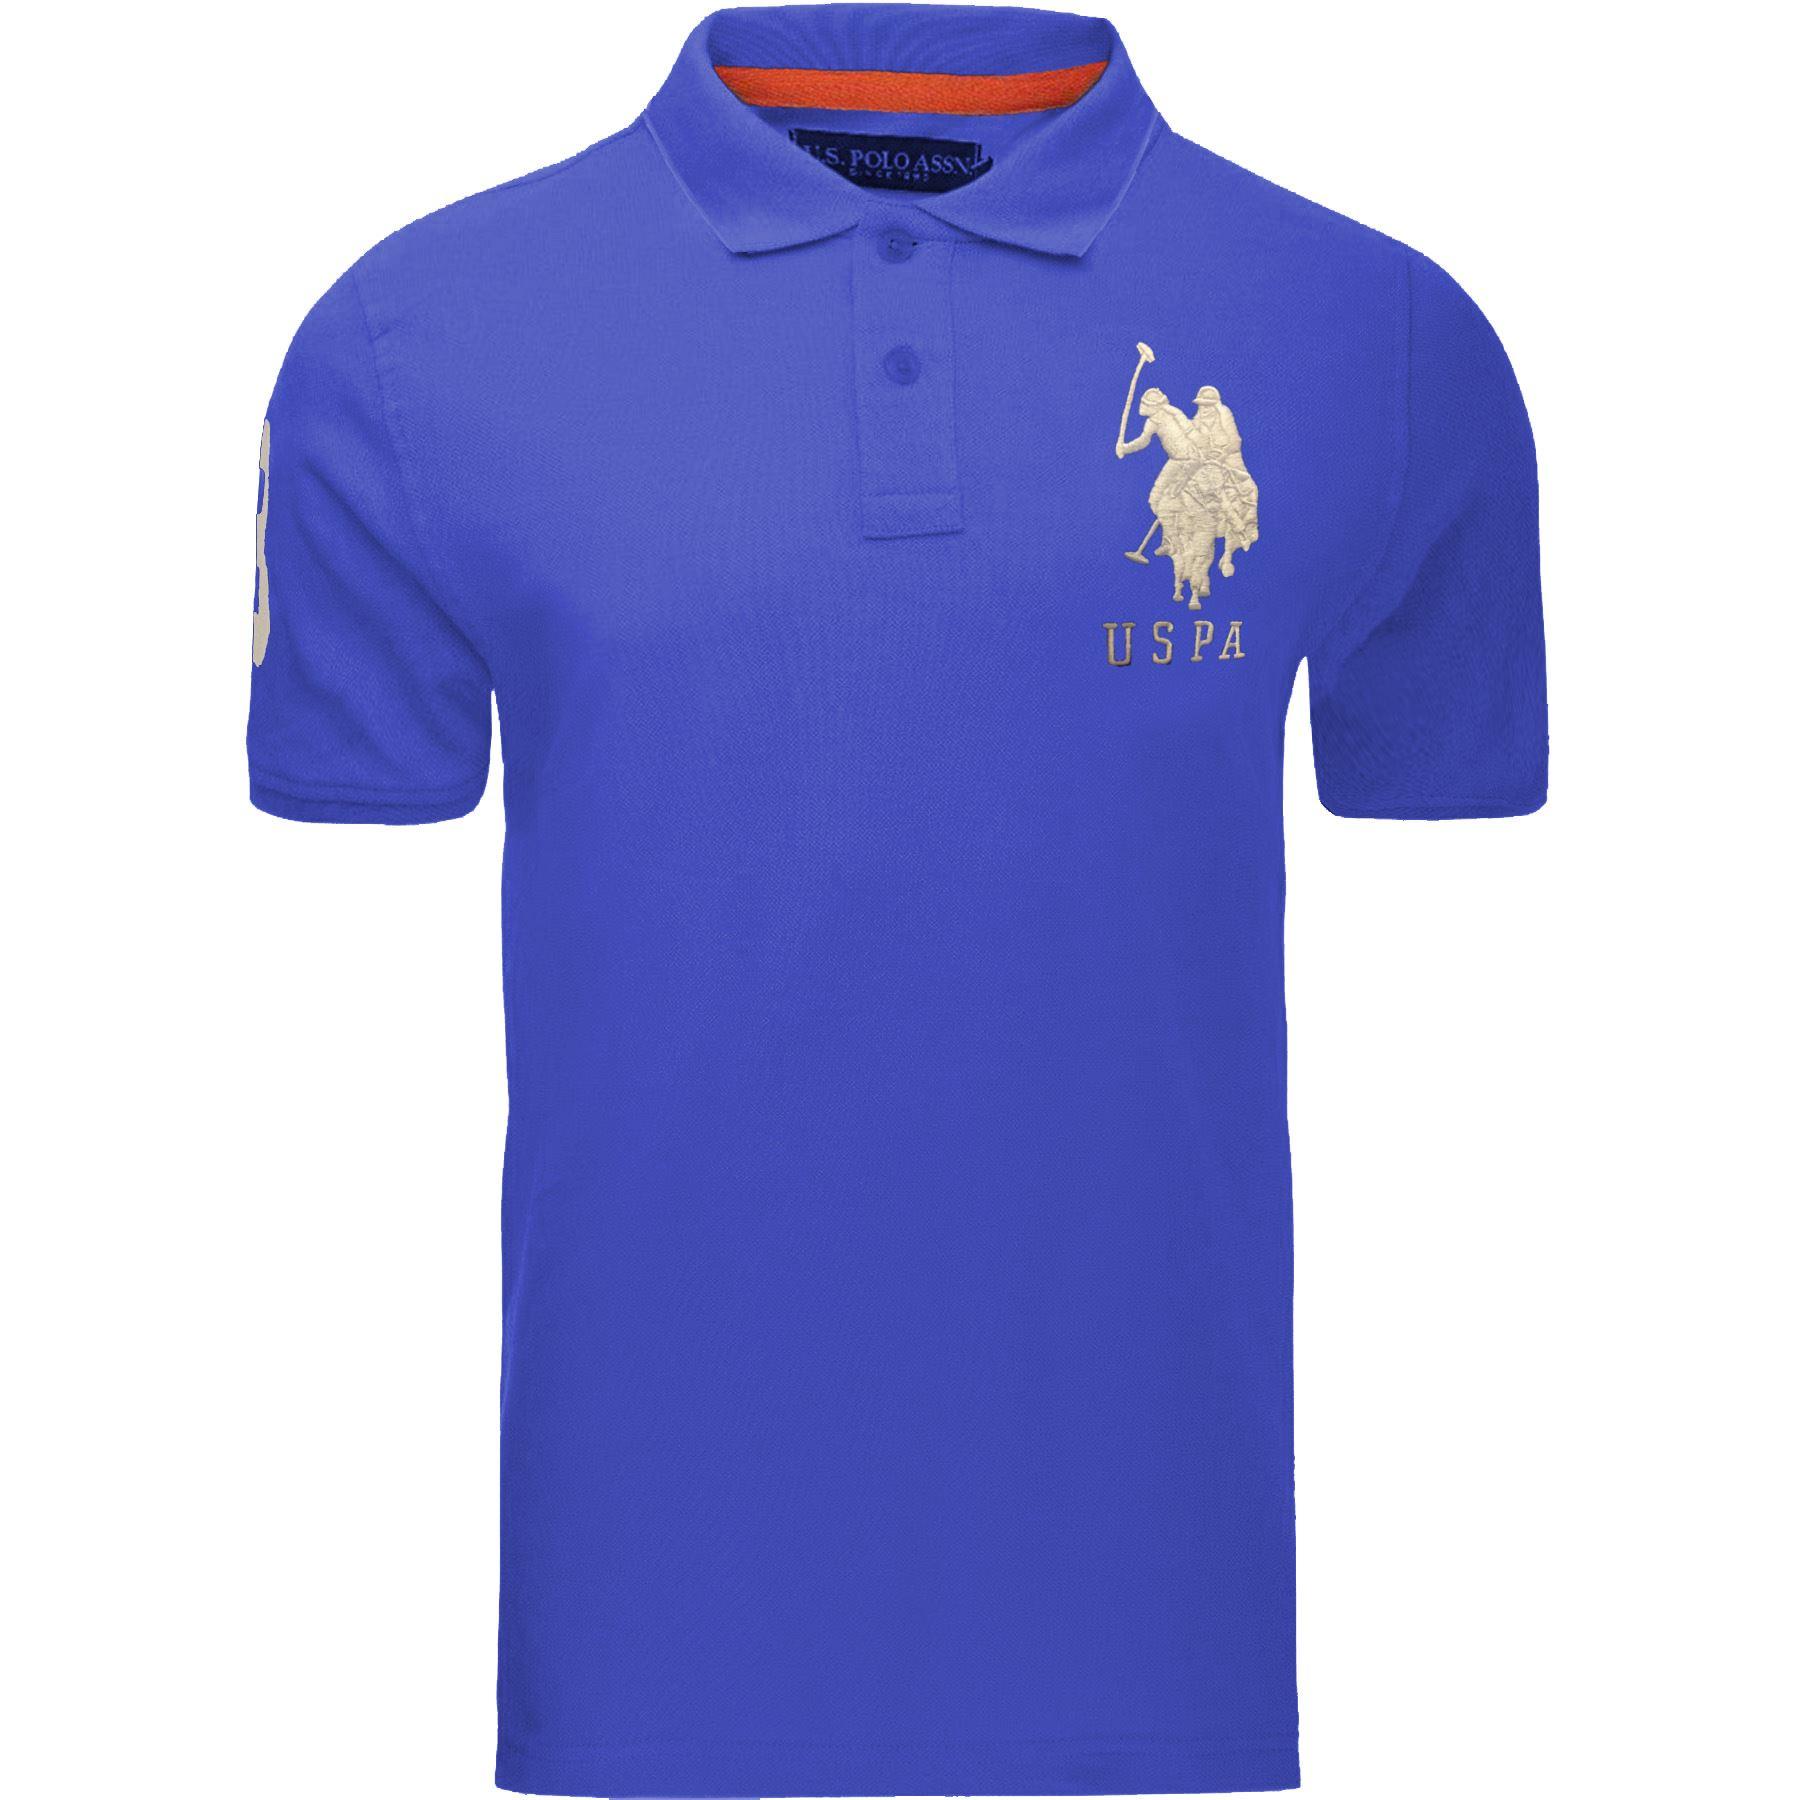 Camiseta-para-Hombre-US-Polo-Assn-Original-Pique-Polo-Custom-Fit-Camisa-Manga-Corta-Top